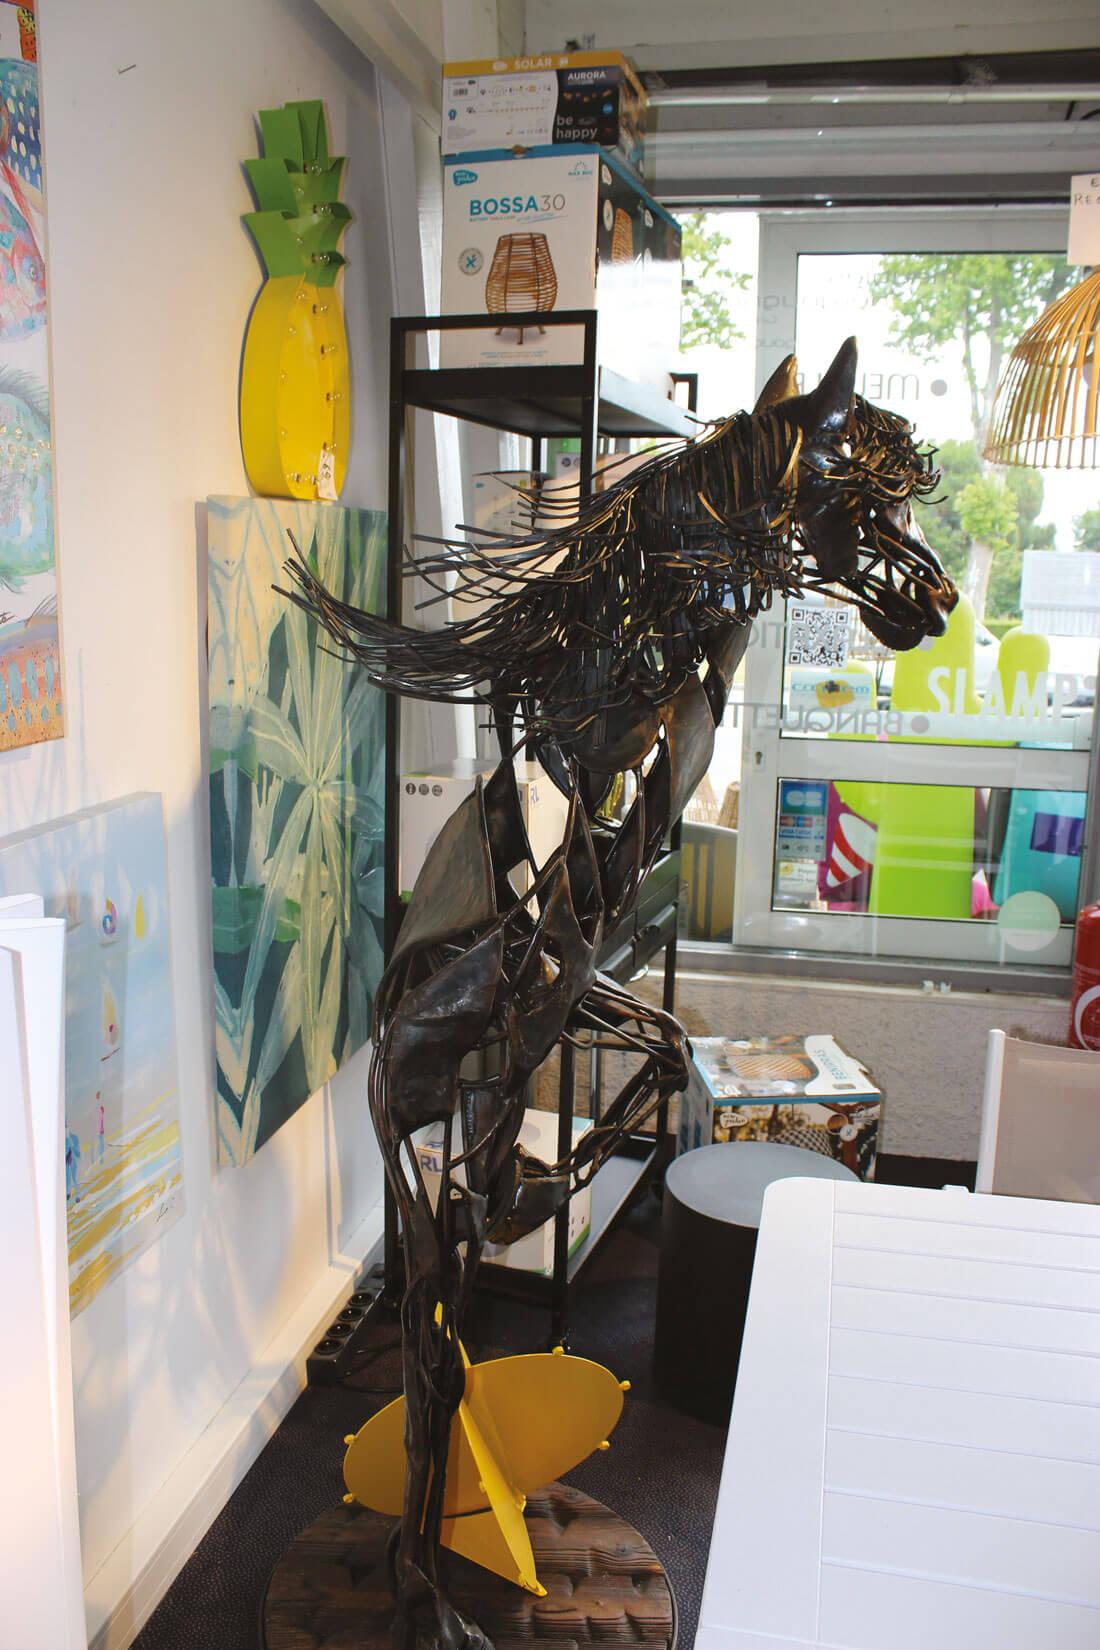 2021 09 tendances interieur franck koob sculpture 06